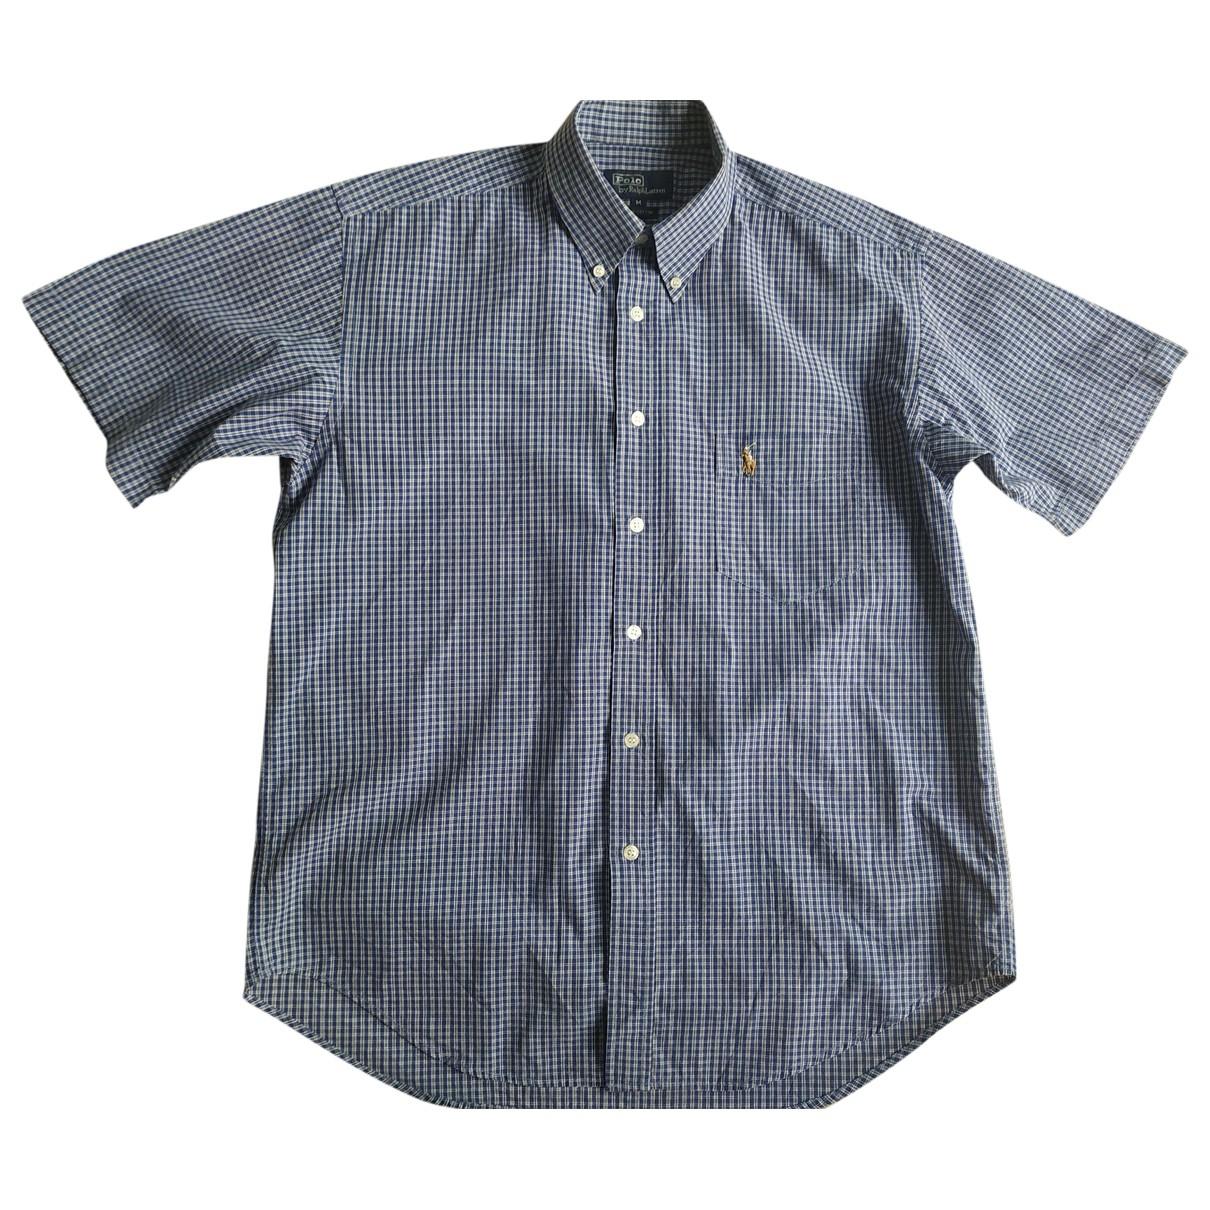 Polo Ralph Lauren \N Hemden in  Blau Baumwolle